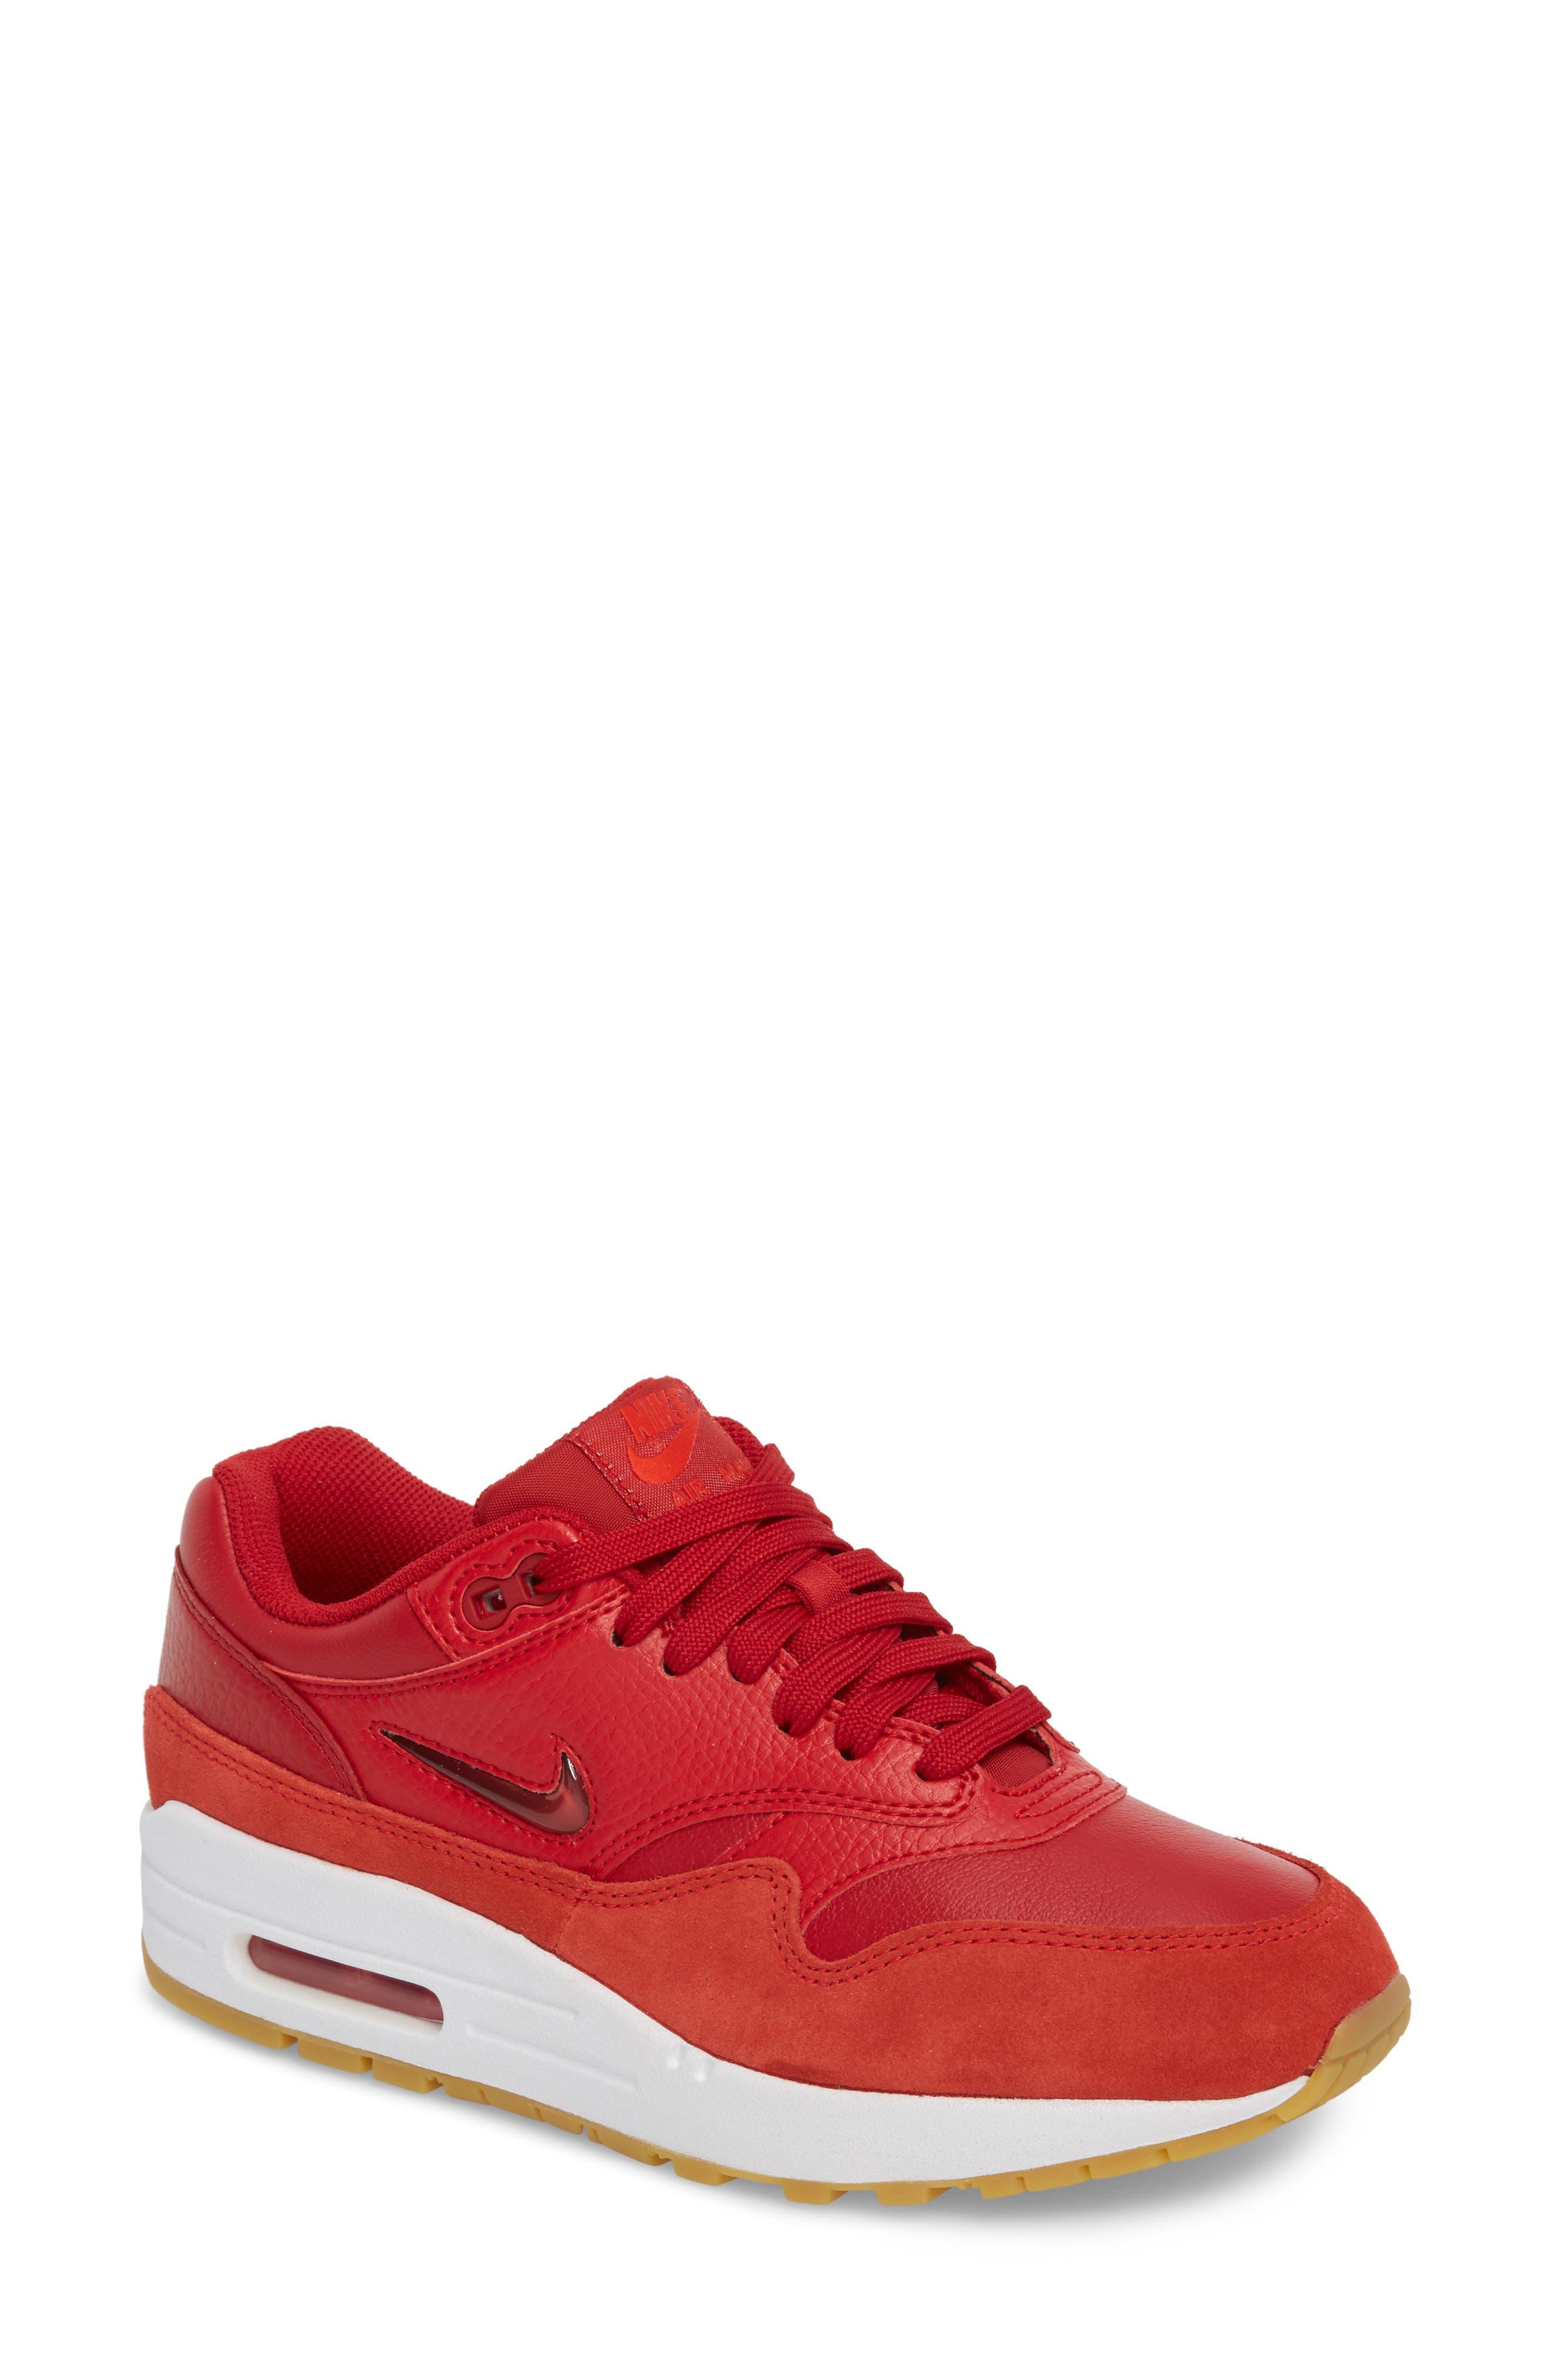 Air Max 1 Premium SC Sneaker,                         Main,                         color, Gym Red/ Gym Red